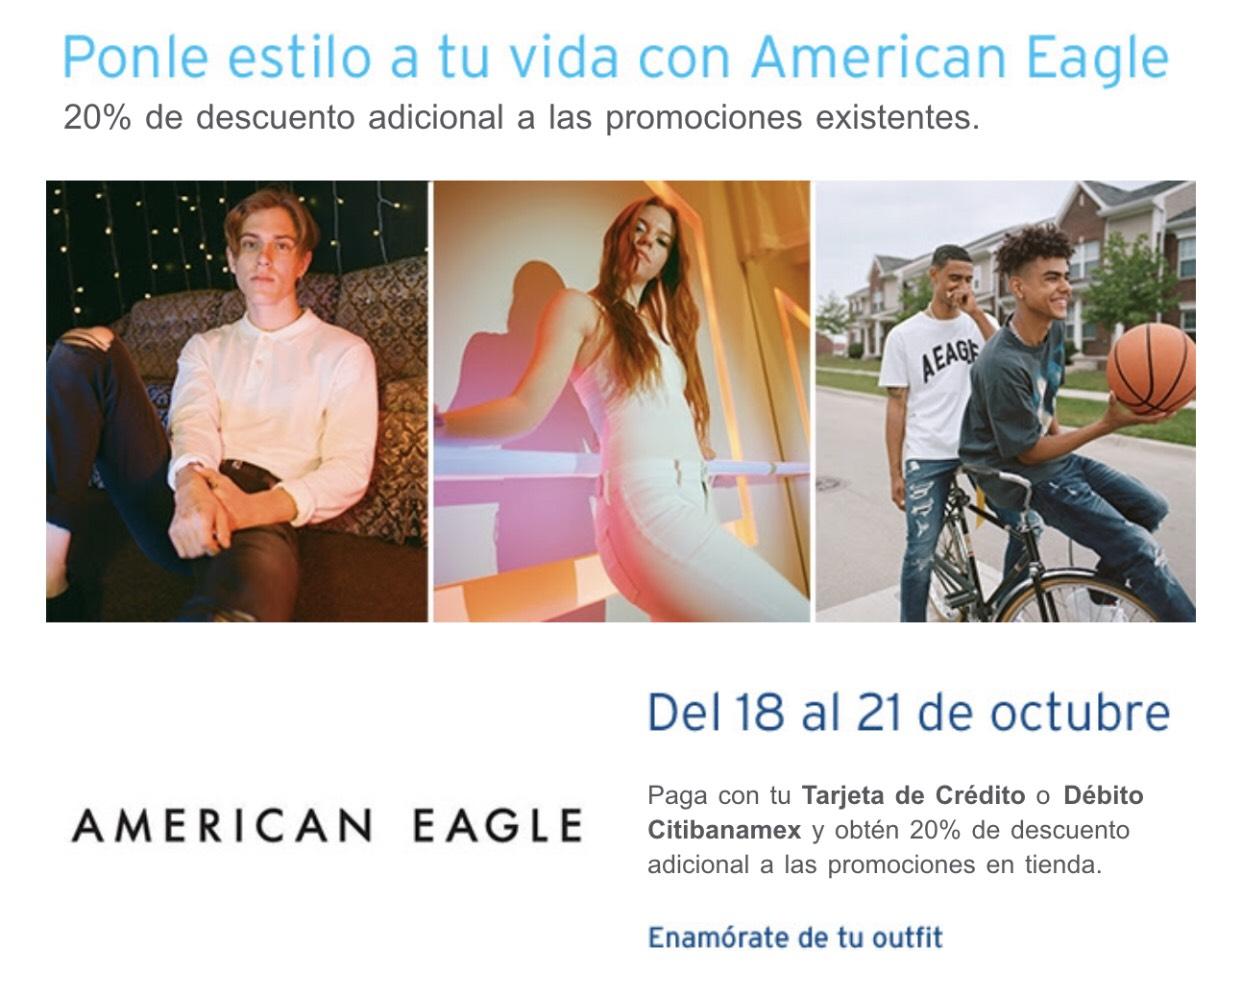 American Eagle: 20% menos con tu Tarjeta de Crédito o Débito Citibanamex